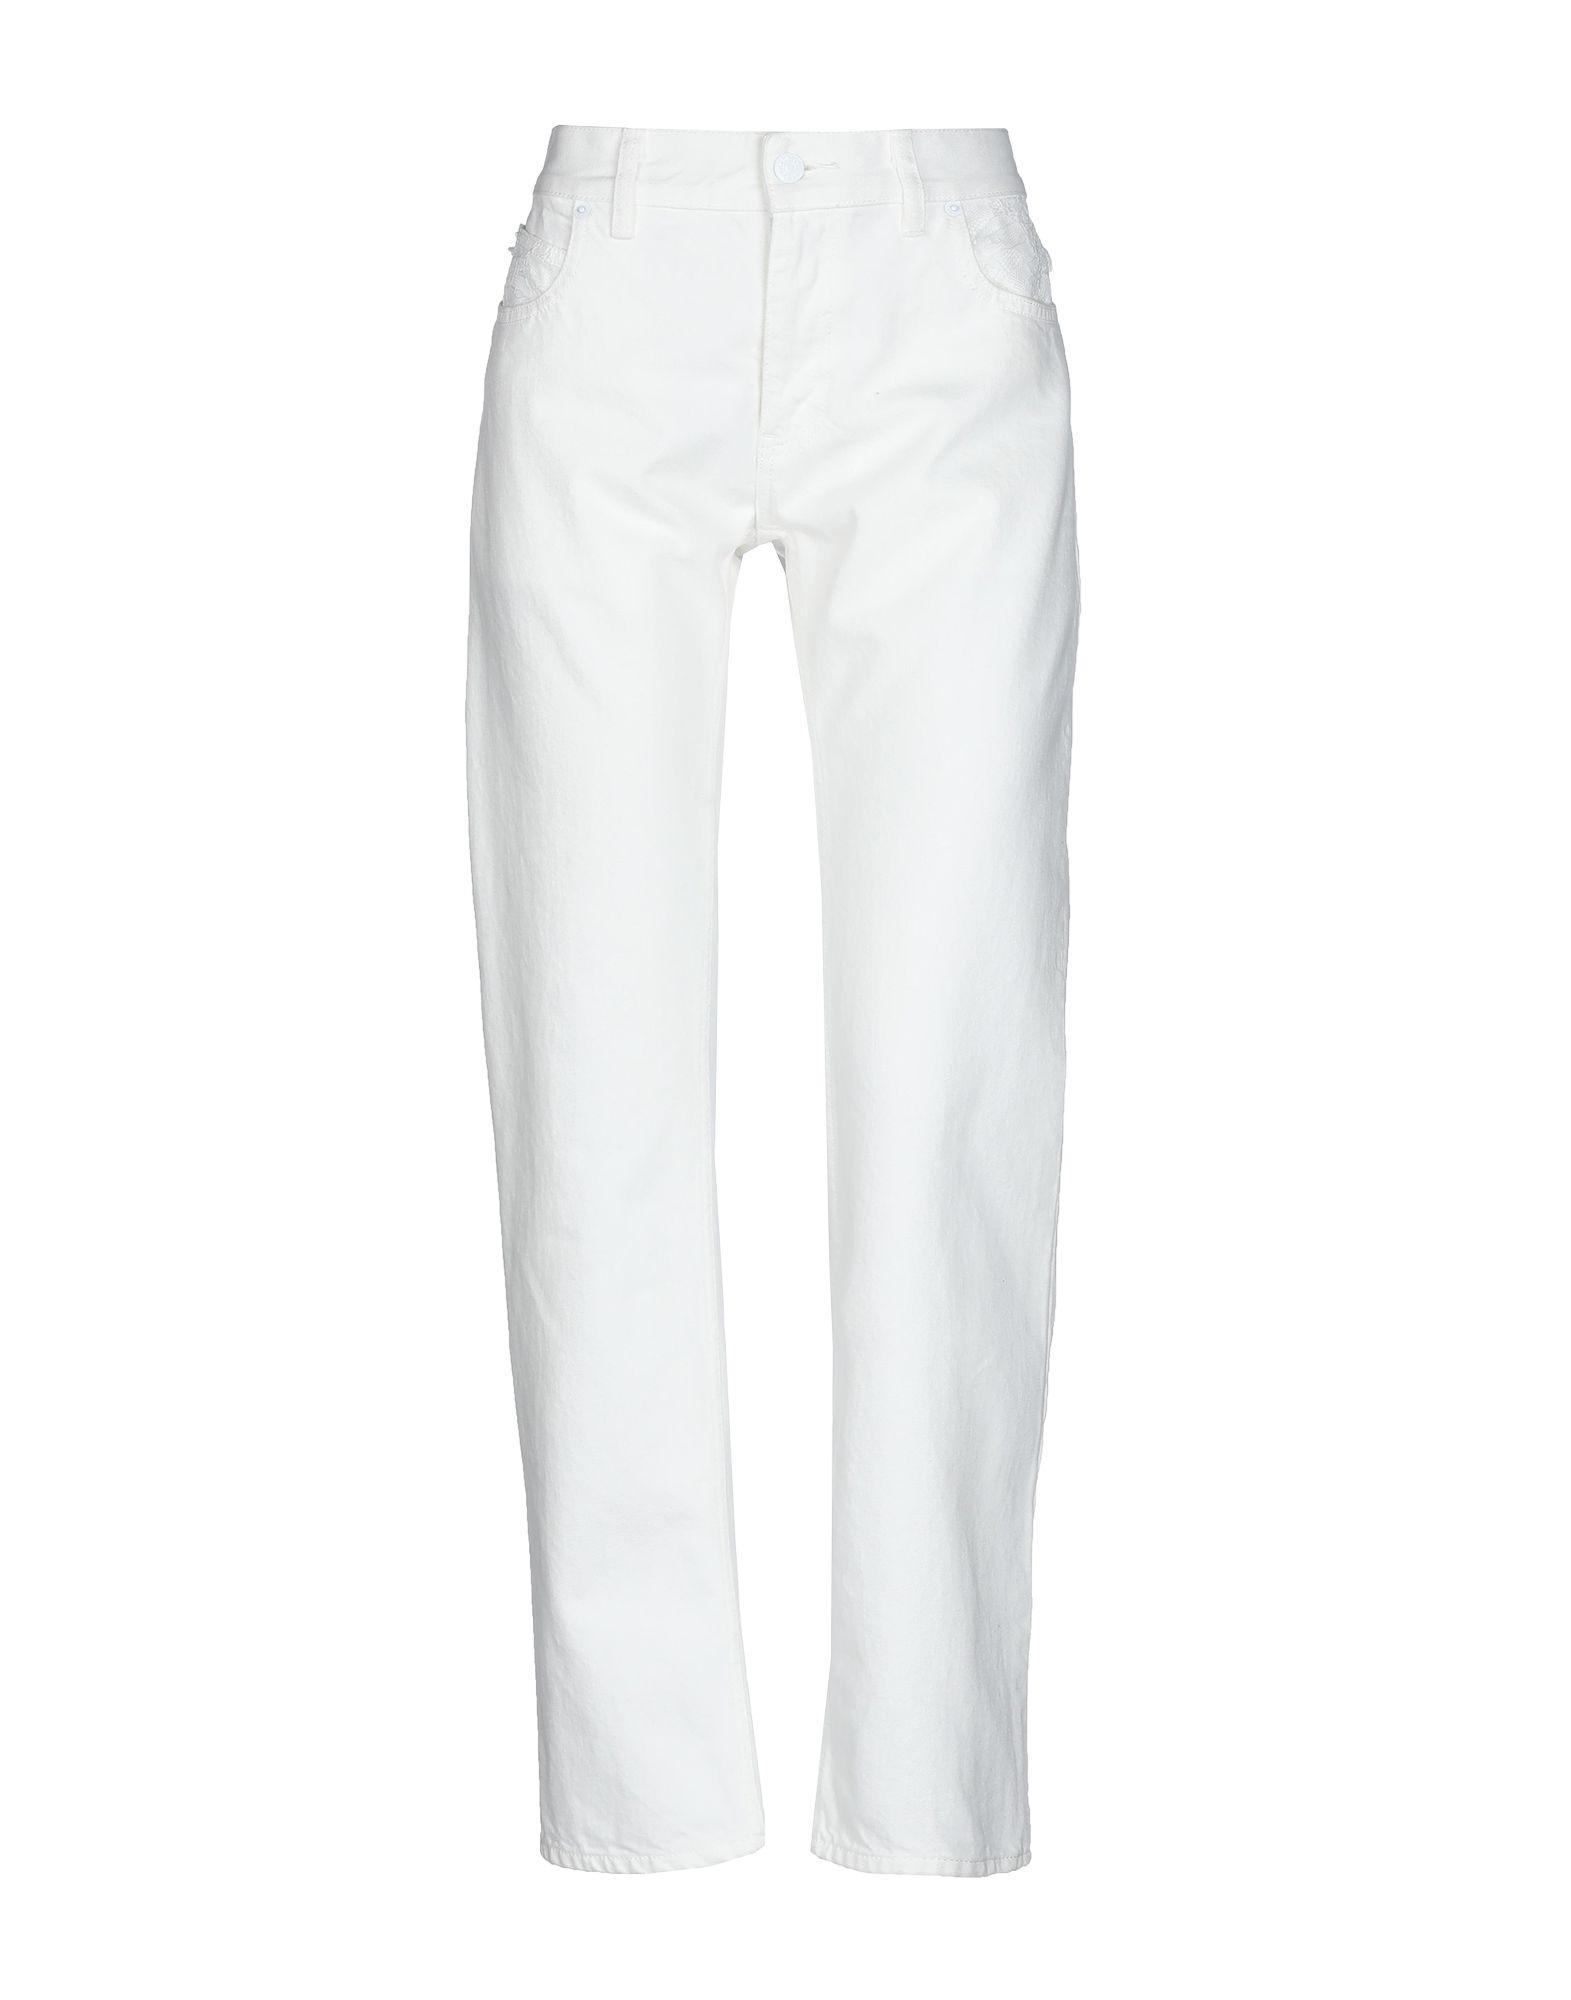 Tsumori Chisato Denim Pants In White